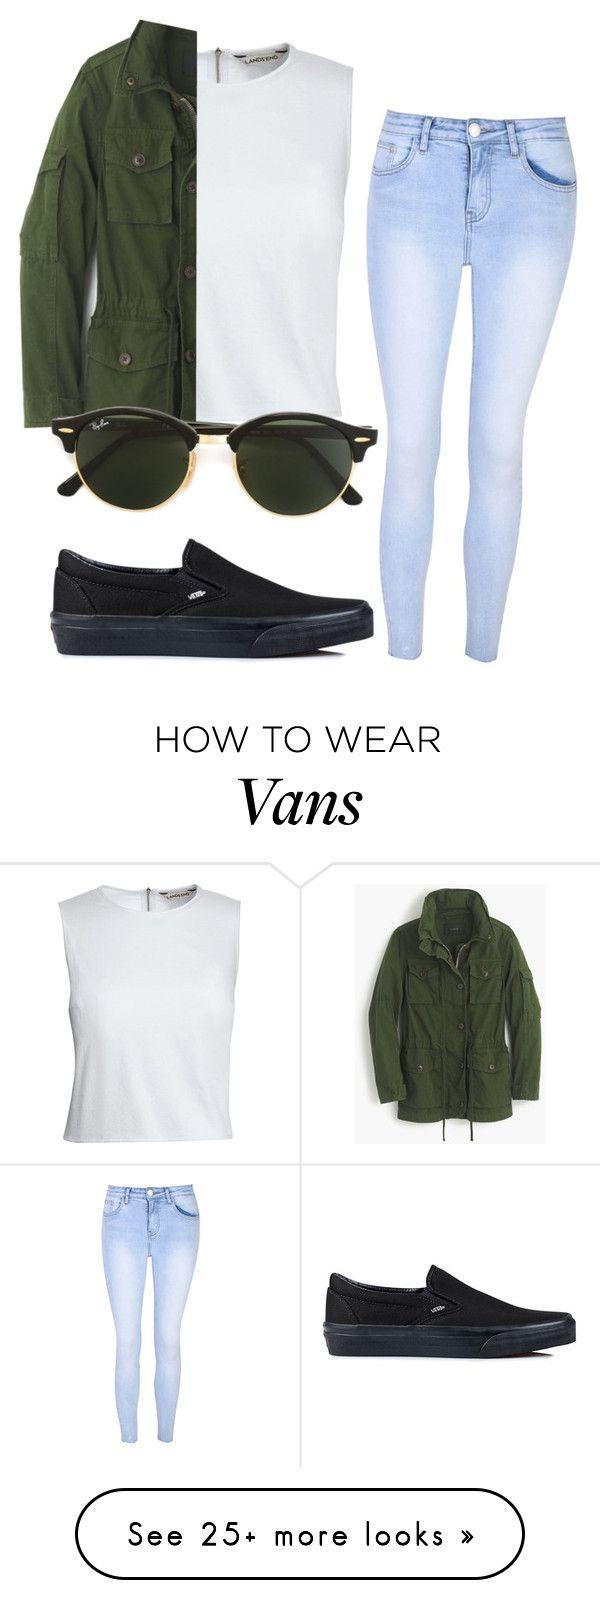 Olive jacket, white tank, light denim jeans, black vans